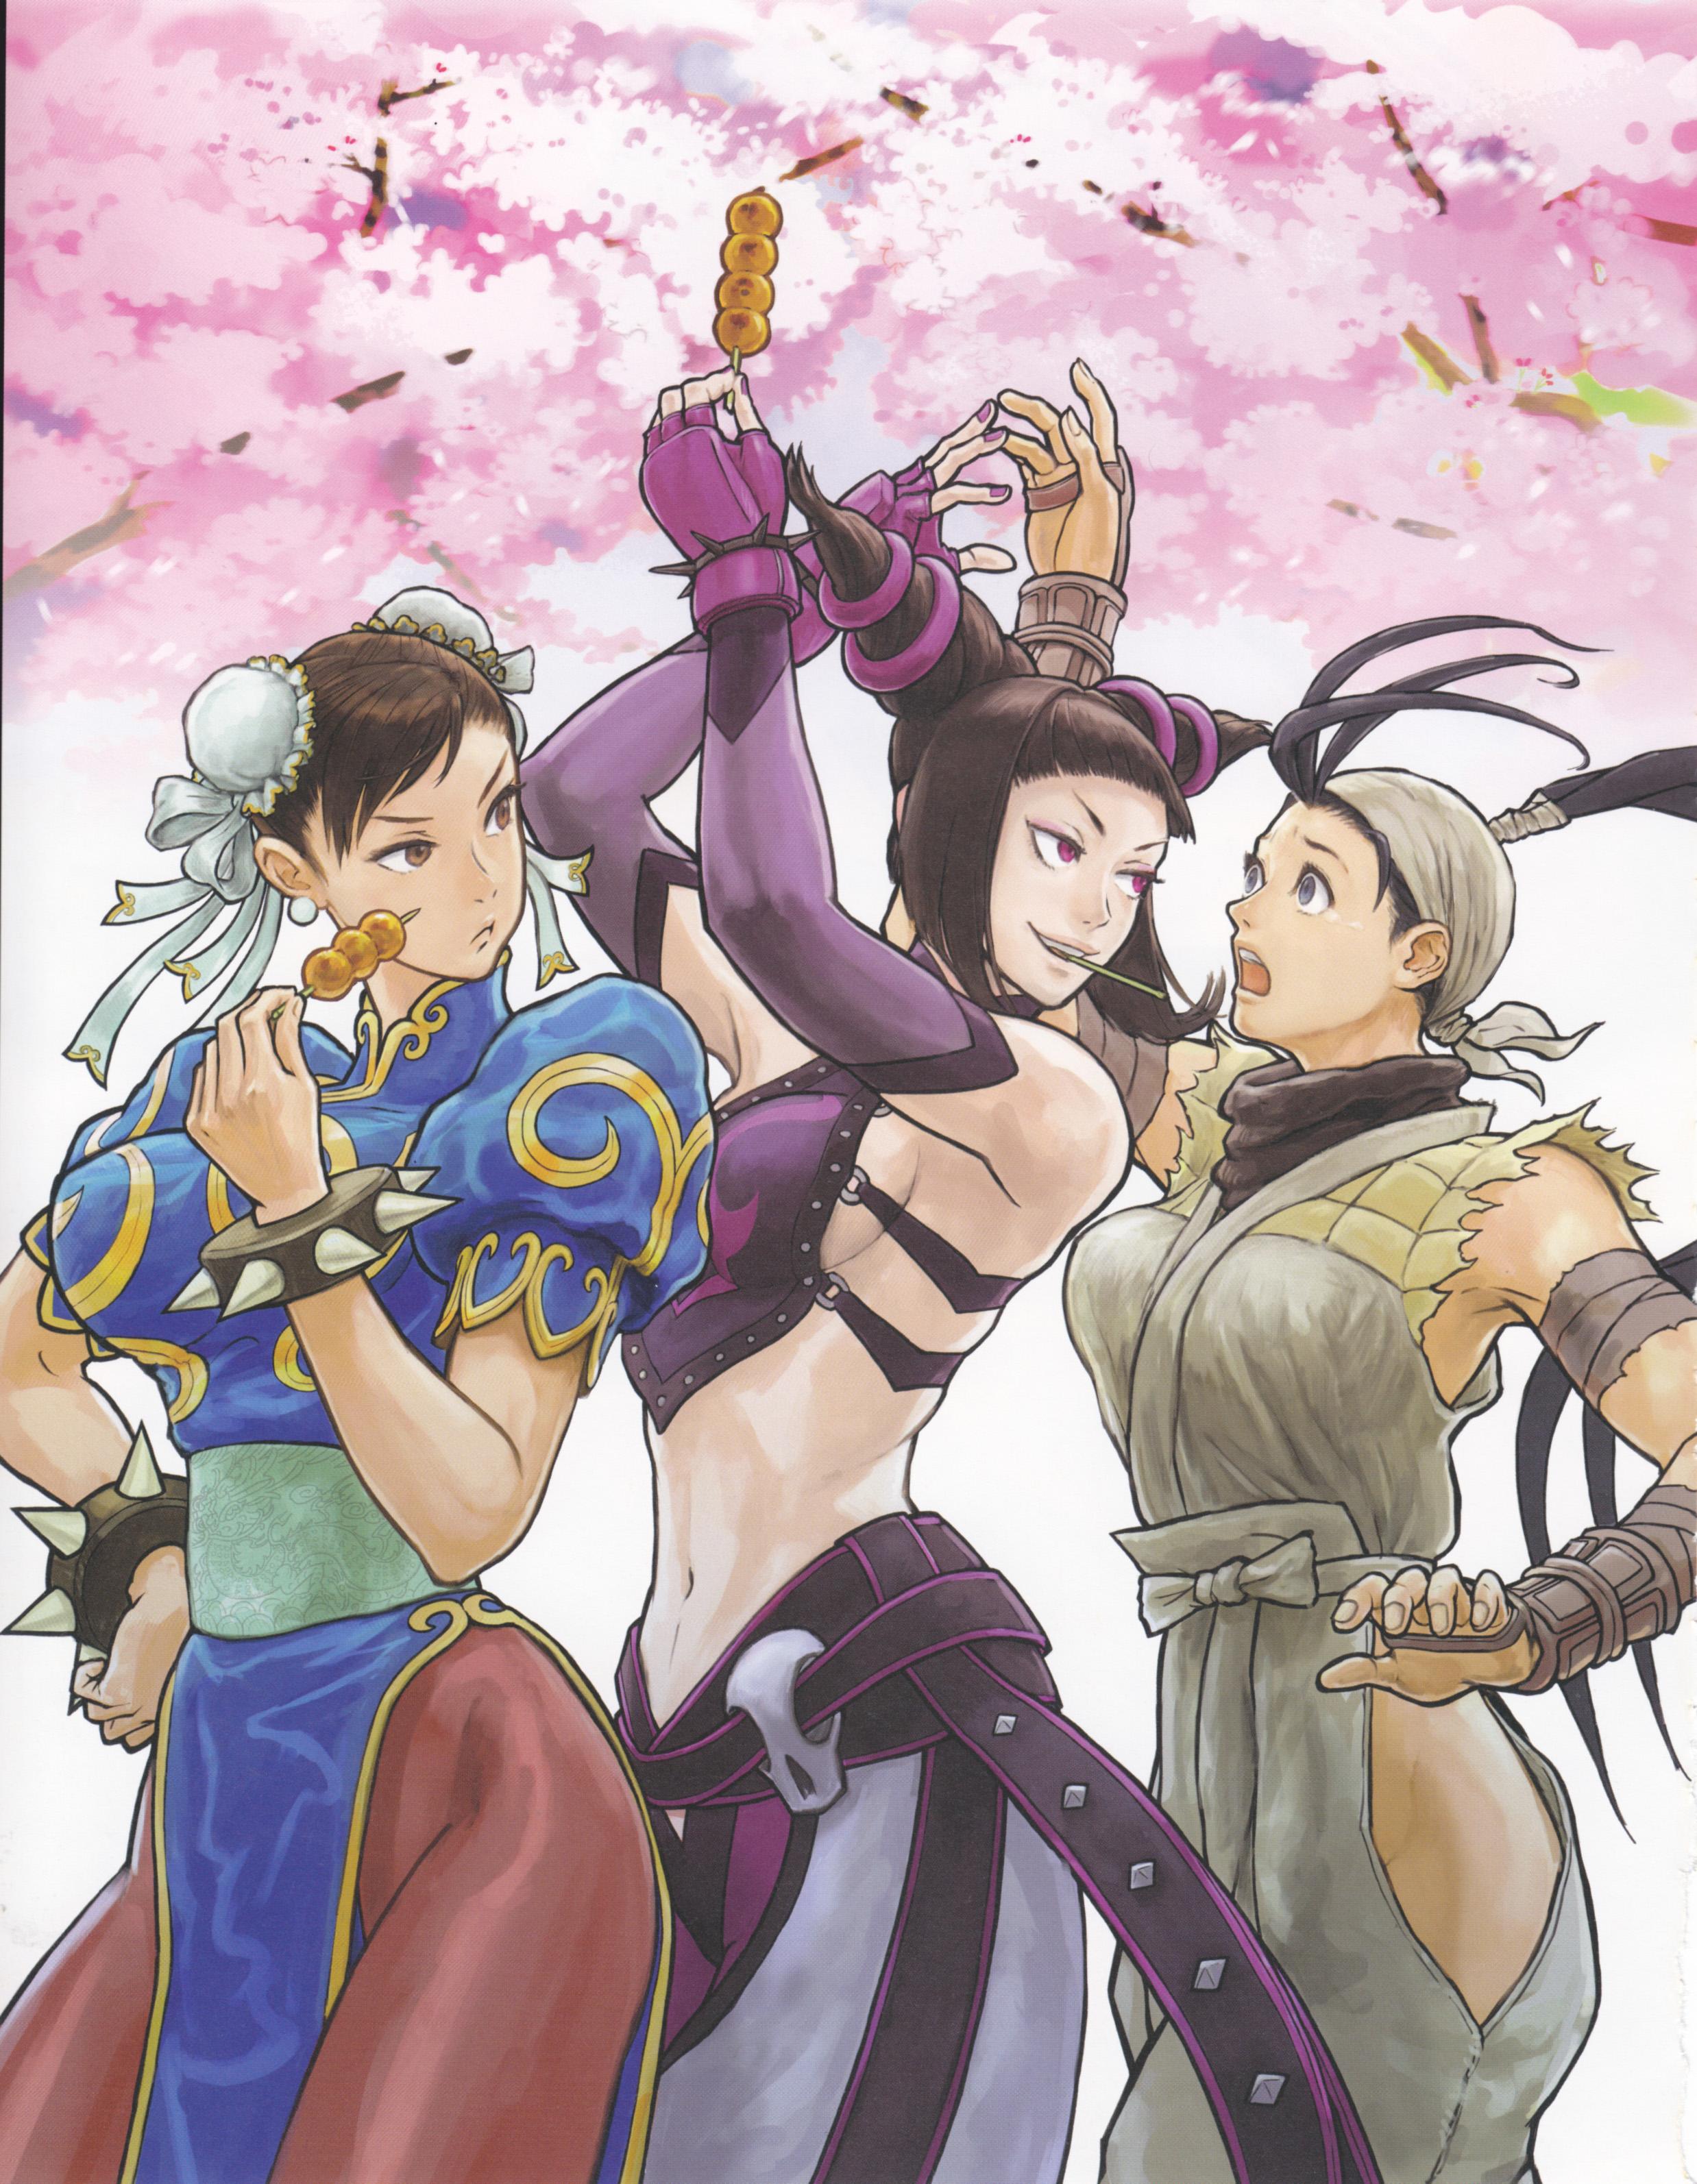 Chun Li Han Juri And Ibuki Street Fighter And 1 More Drawn By